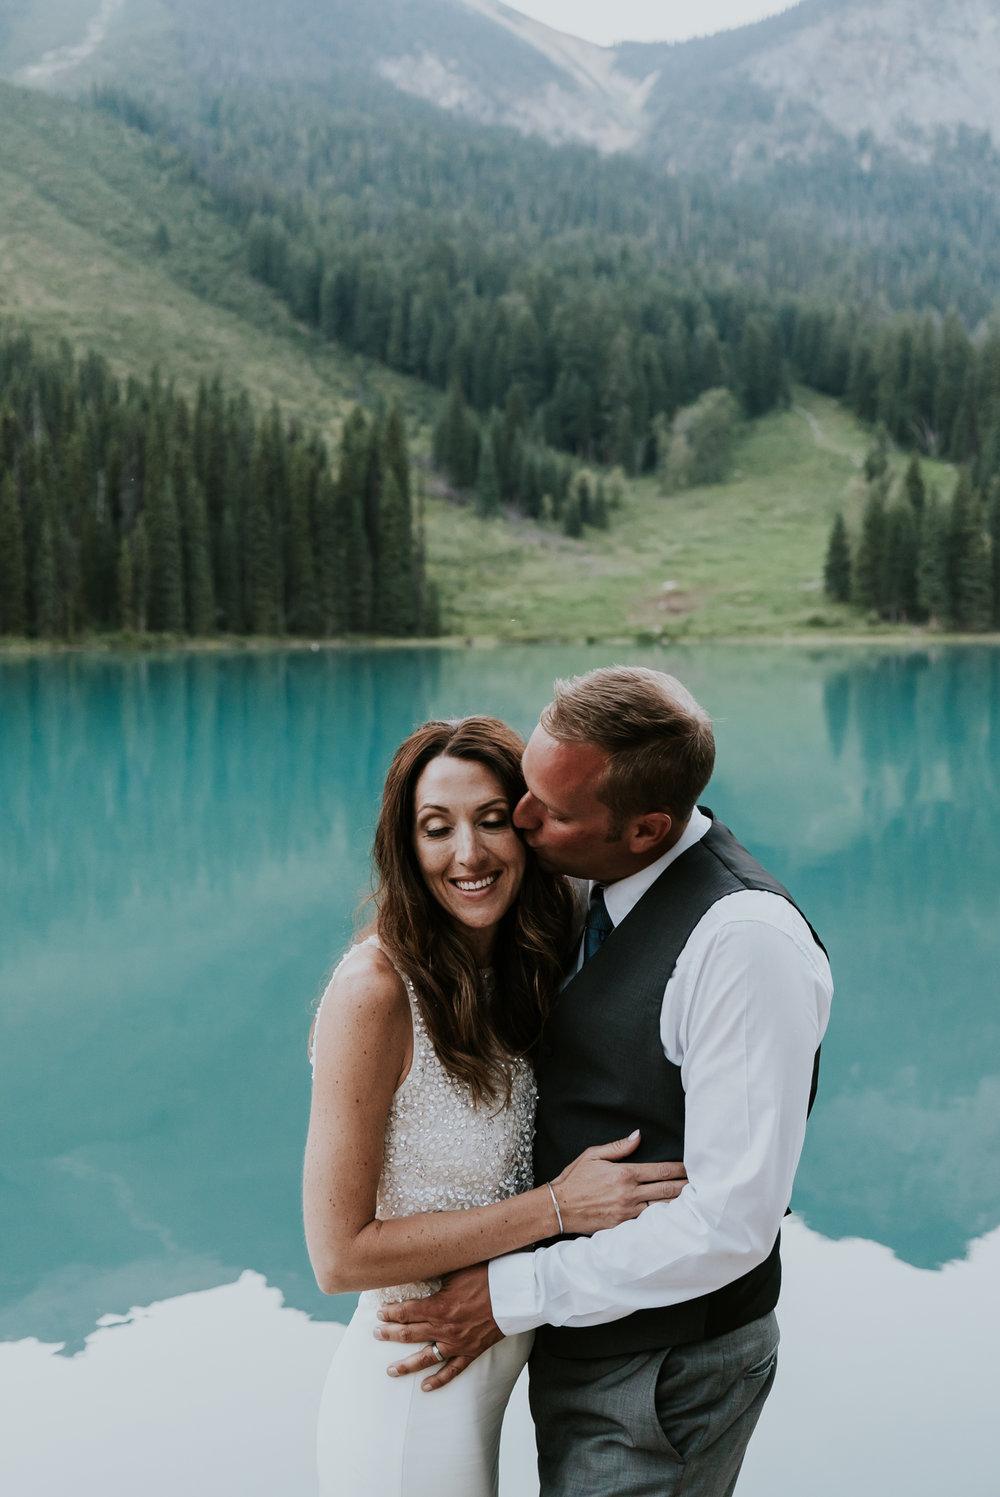 raquel and sean's wedding    emerald lake lodge, yoho national park, canada